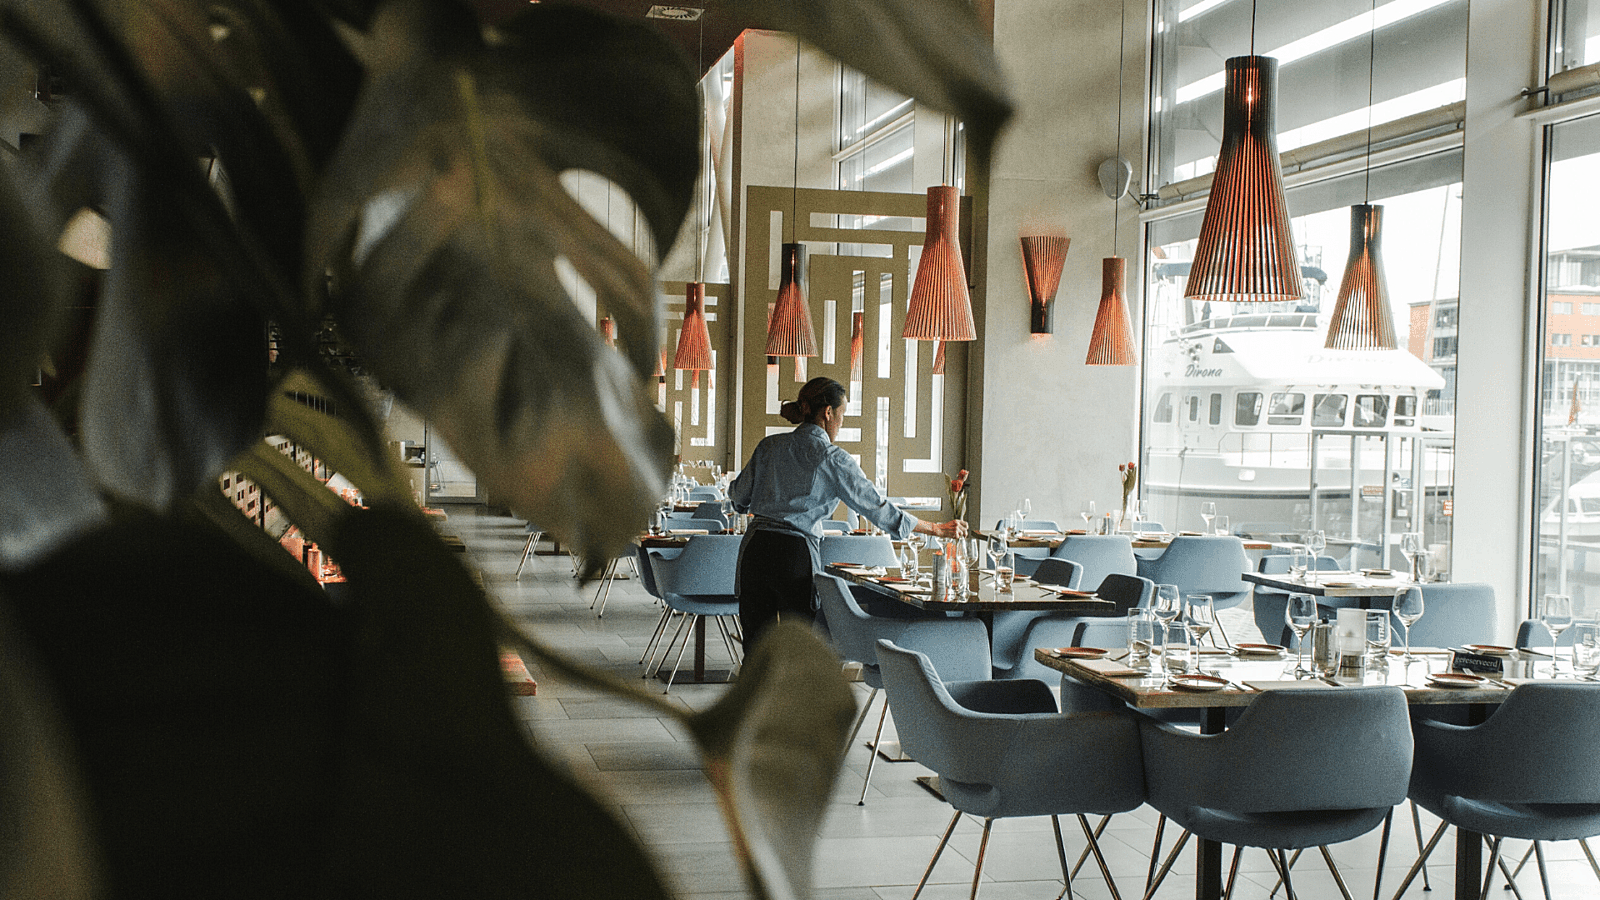 Restaurant soft opening